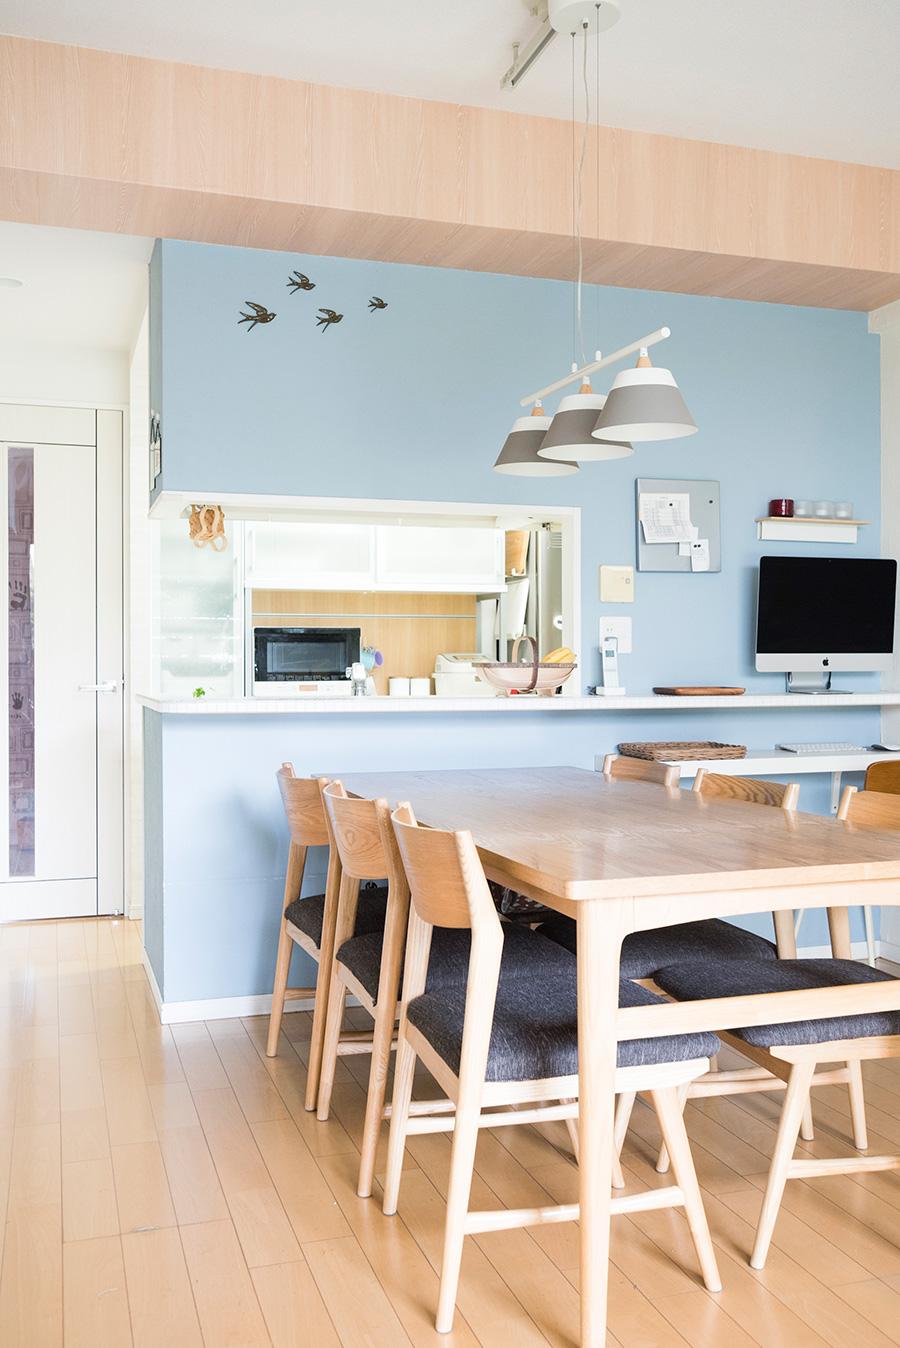 DIYで薄いブルーを塗装したキッチン&ダイニング。北欧テイストにまとめている。